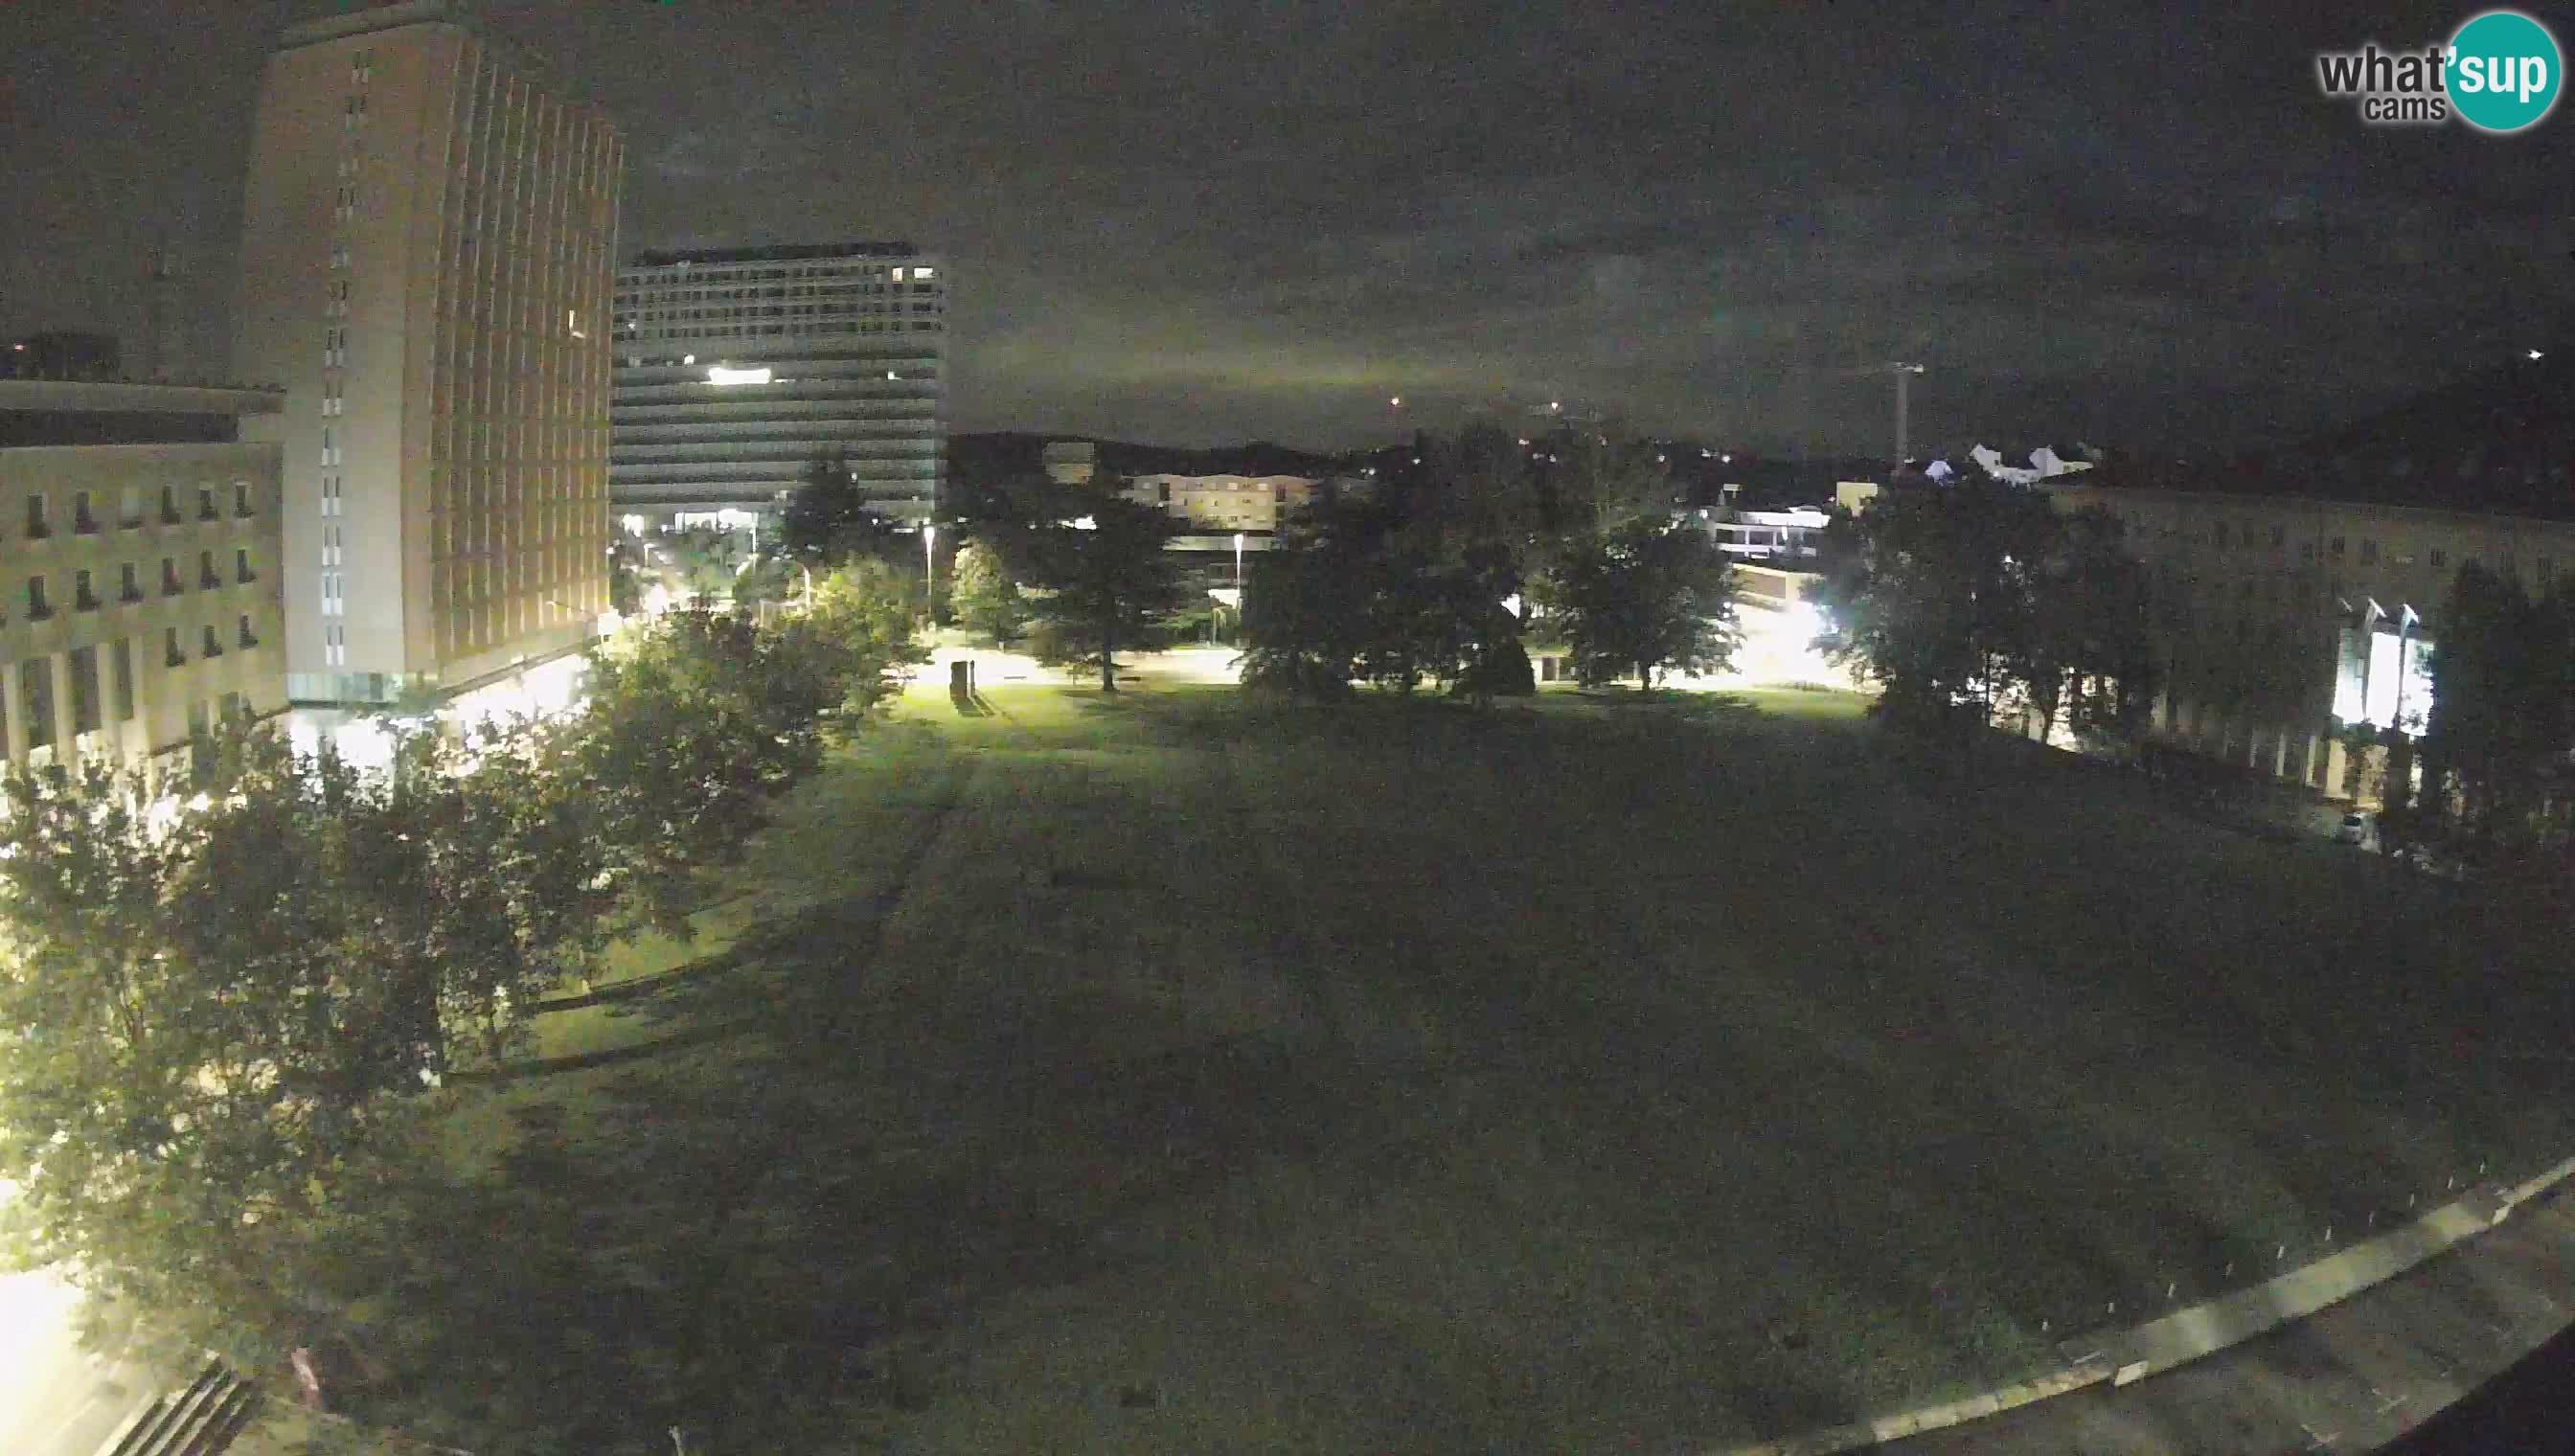 LIVEcam Nova Gorica webcam – Piazza Edvard Kardelj